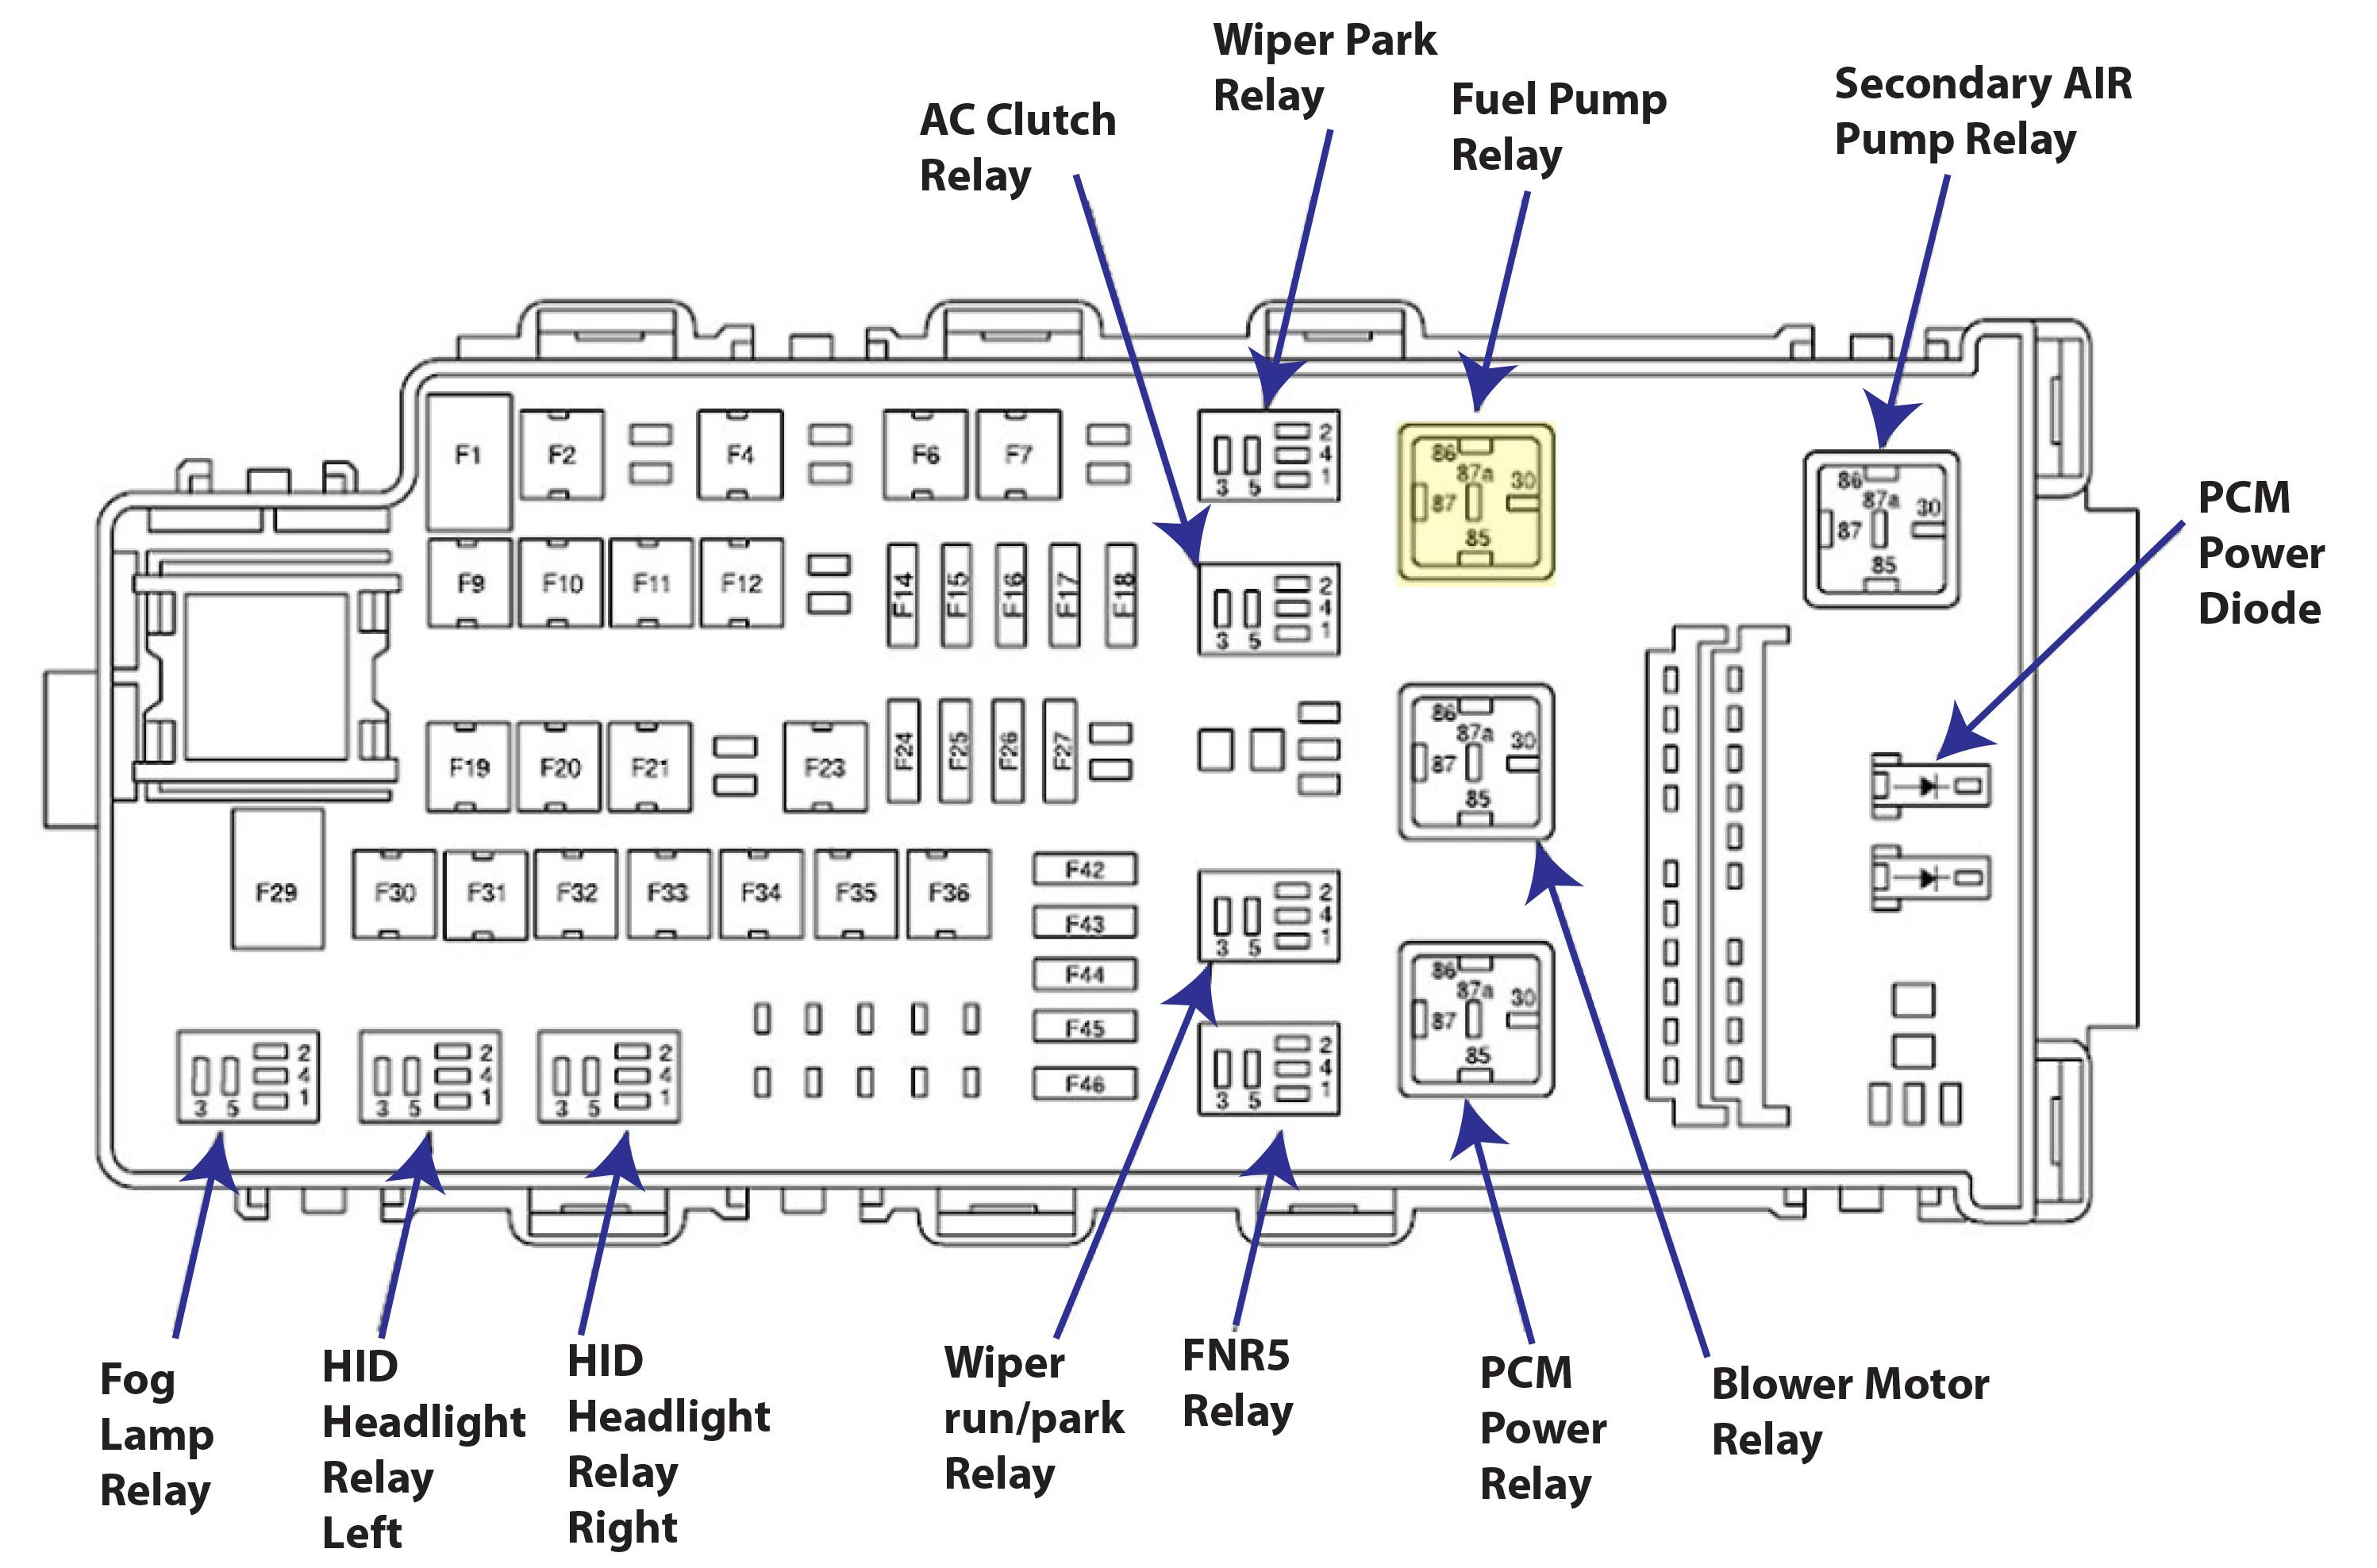 11 Ford Fusion Fuse Box Diagram 6 Pin Wiring Diagram Delco Electronics Cukk Jeanjaures37 Fr